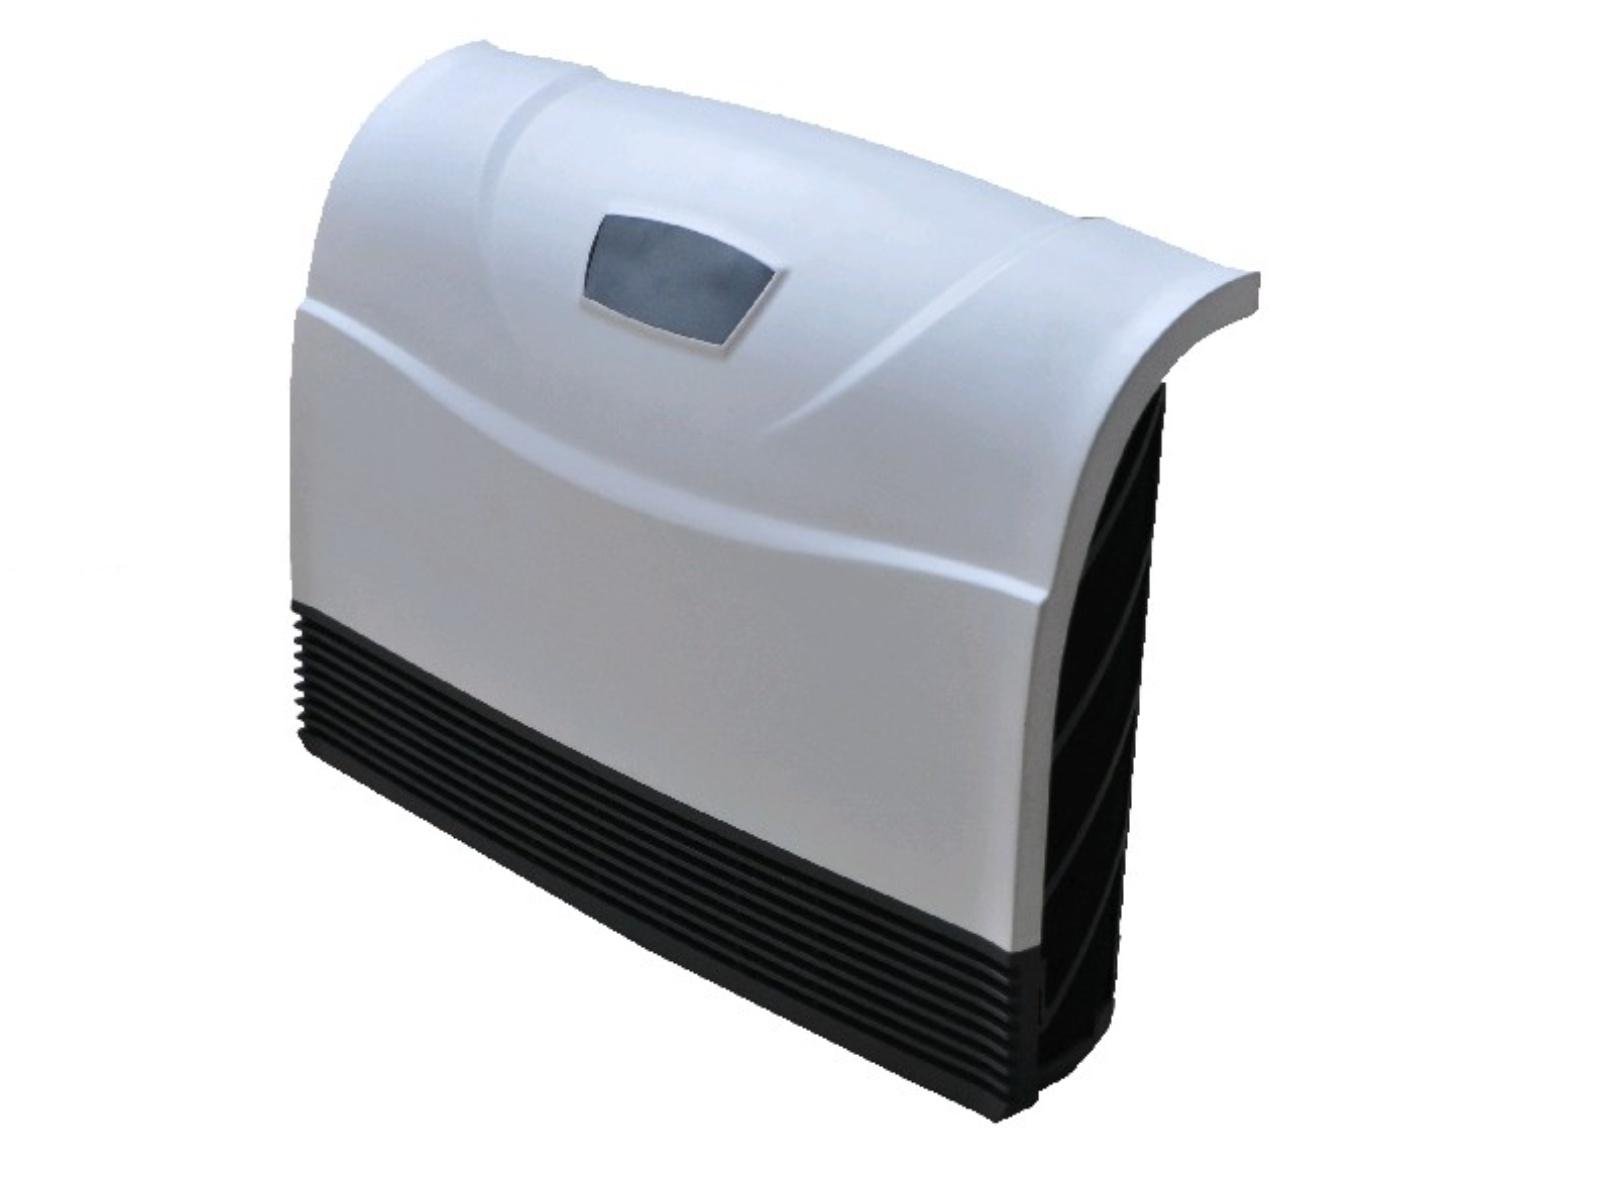 Infrazářič V-GARDEN VeGA Smart HI500